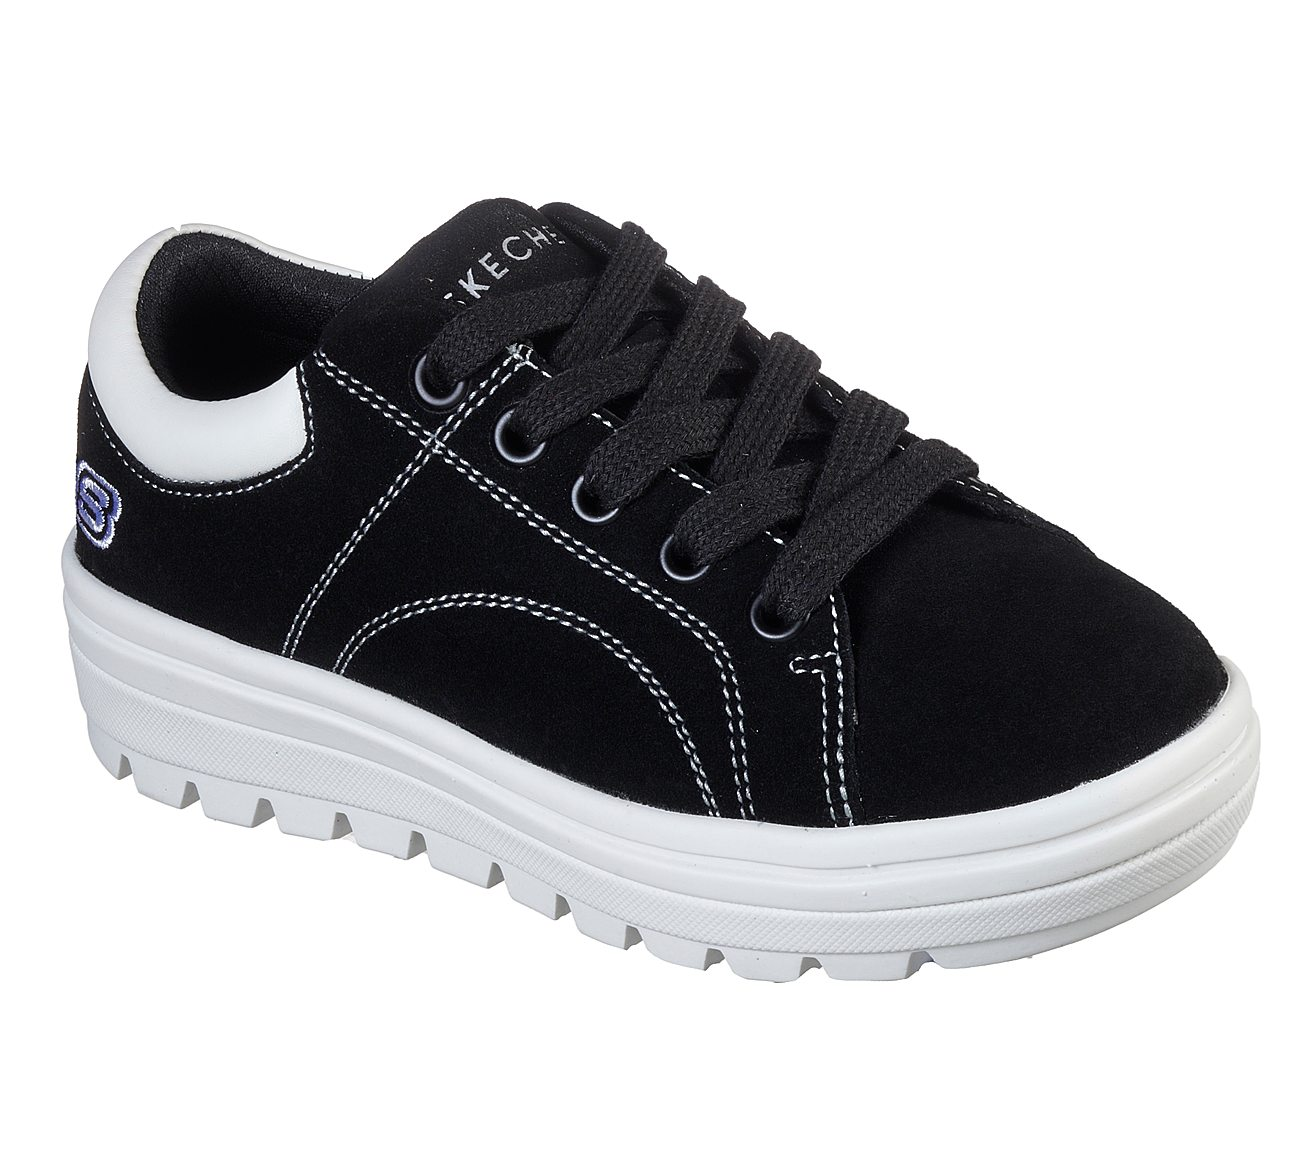 Skechers Street Cleat Back Again Platform Sneaker femmes's